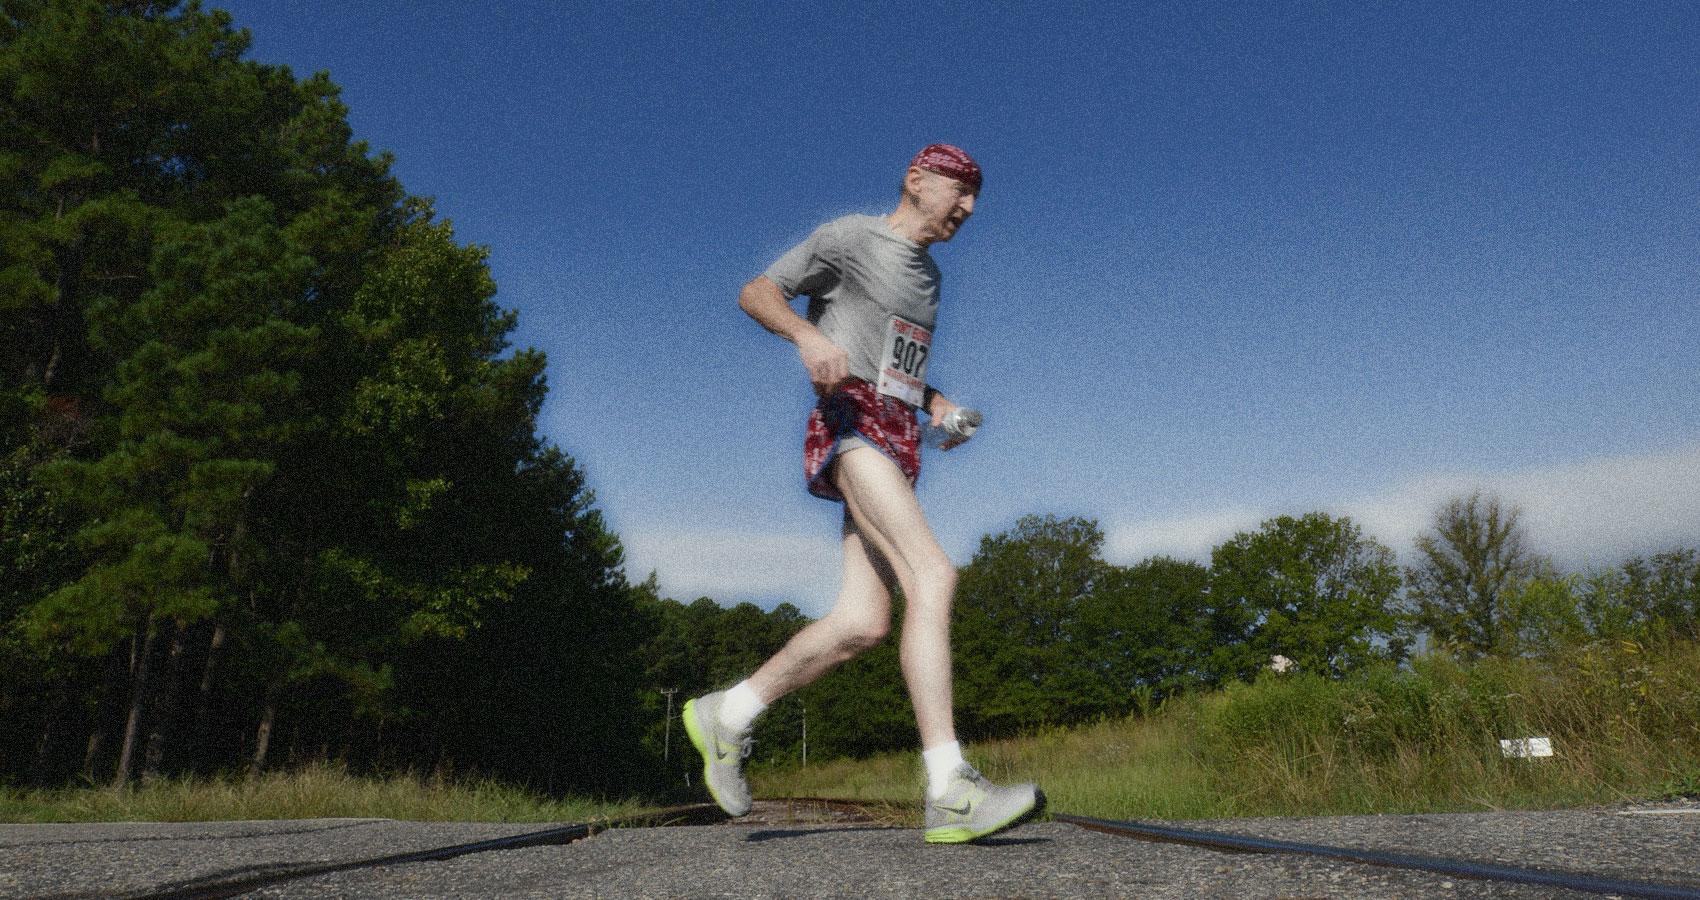 The Old Runner written by Ian Fletcher at Spillwords.com